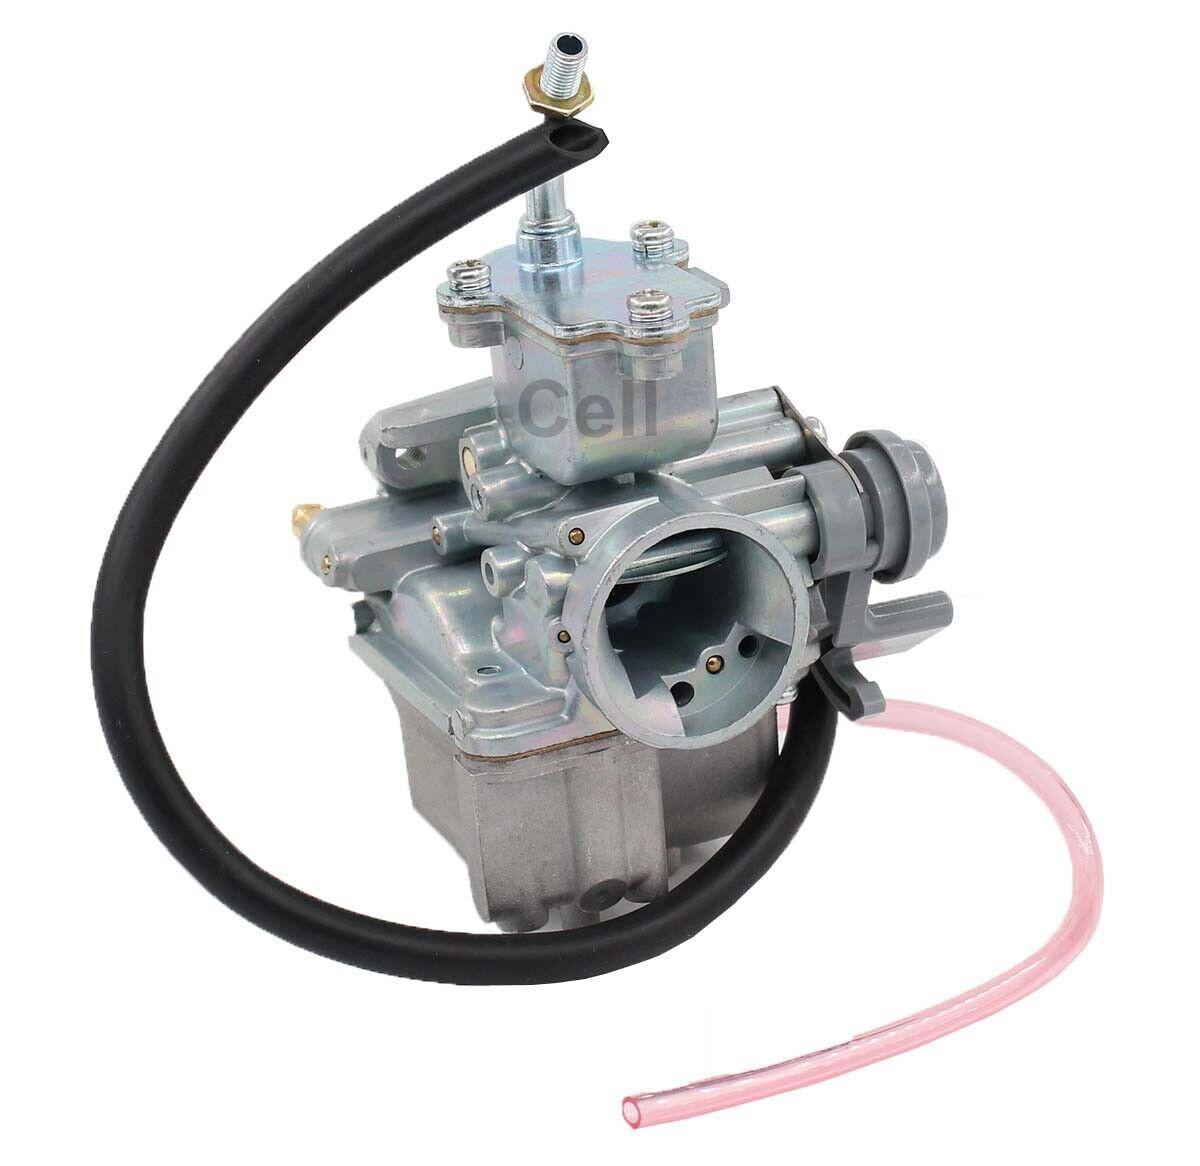 ATV, Side-by-Side & UTV Carburetors & Throttlebodies New Carburetor For Yamaha Raptor 80 YFM 80 R W ATV Carb 02 03 04 05 06 07 08